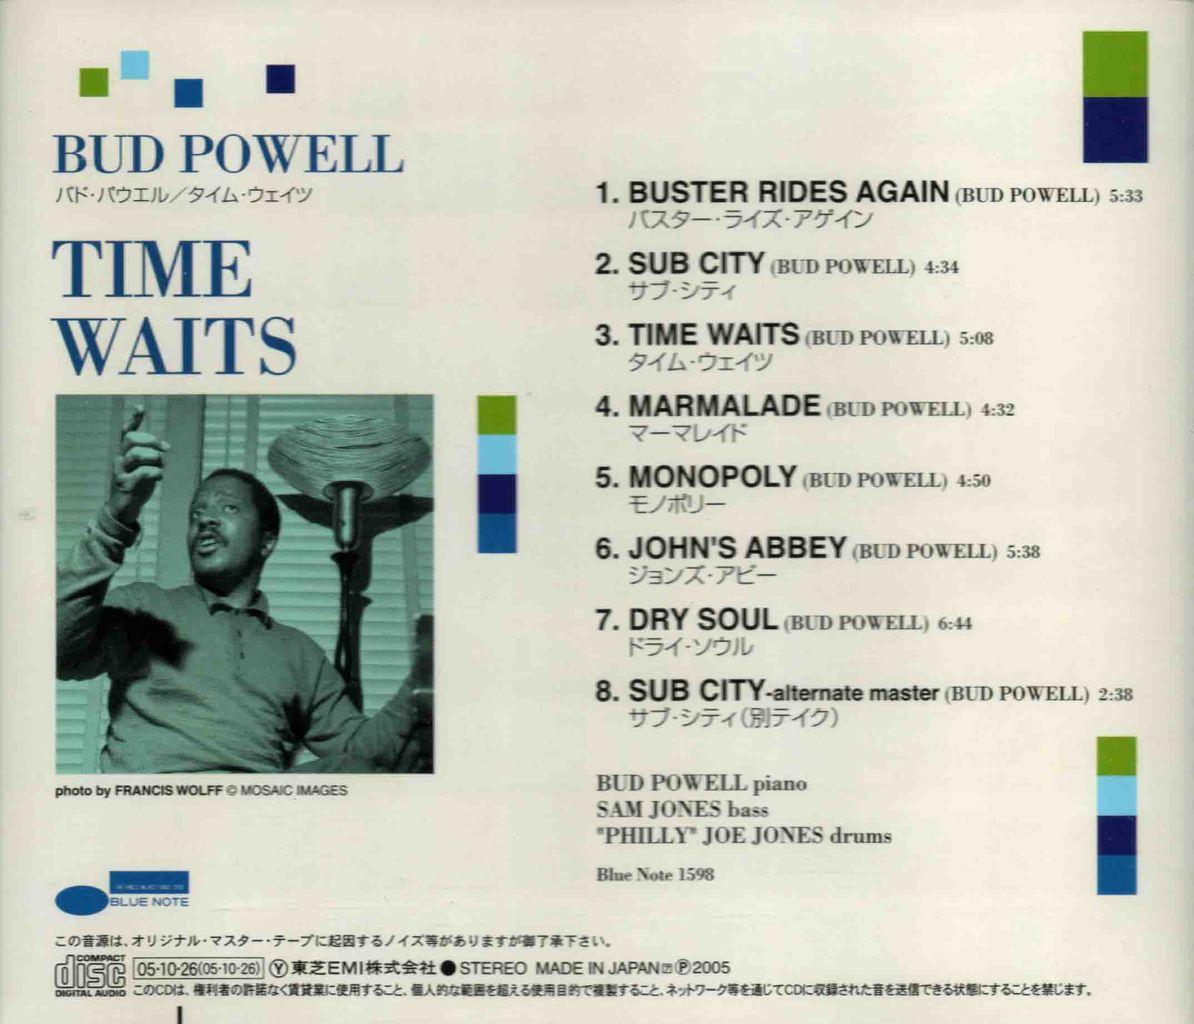 TIME WAITS - THE AMAZING BUD POWELL VOL.4-2